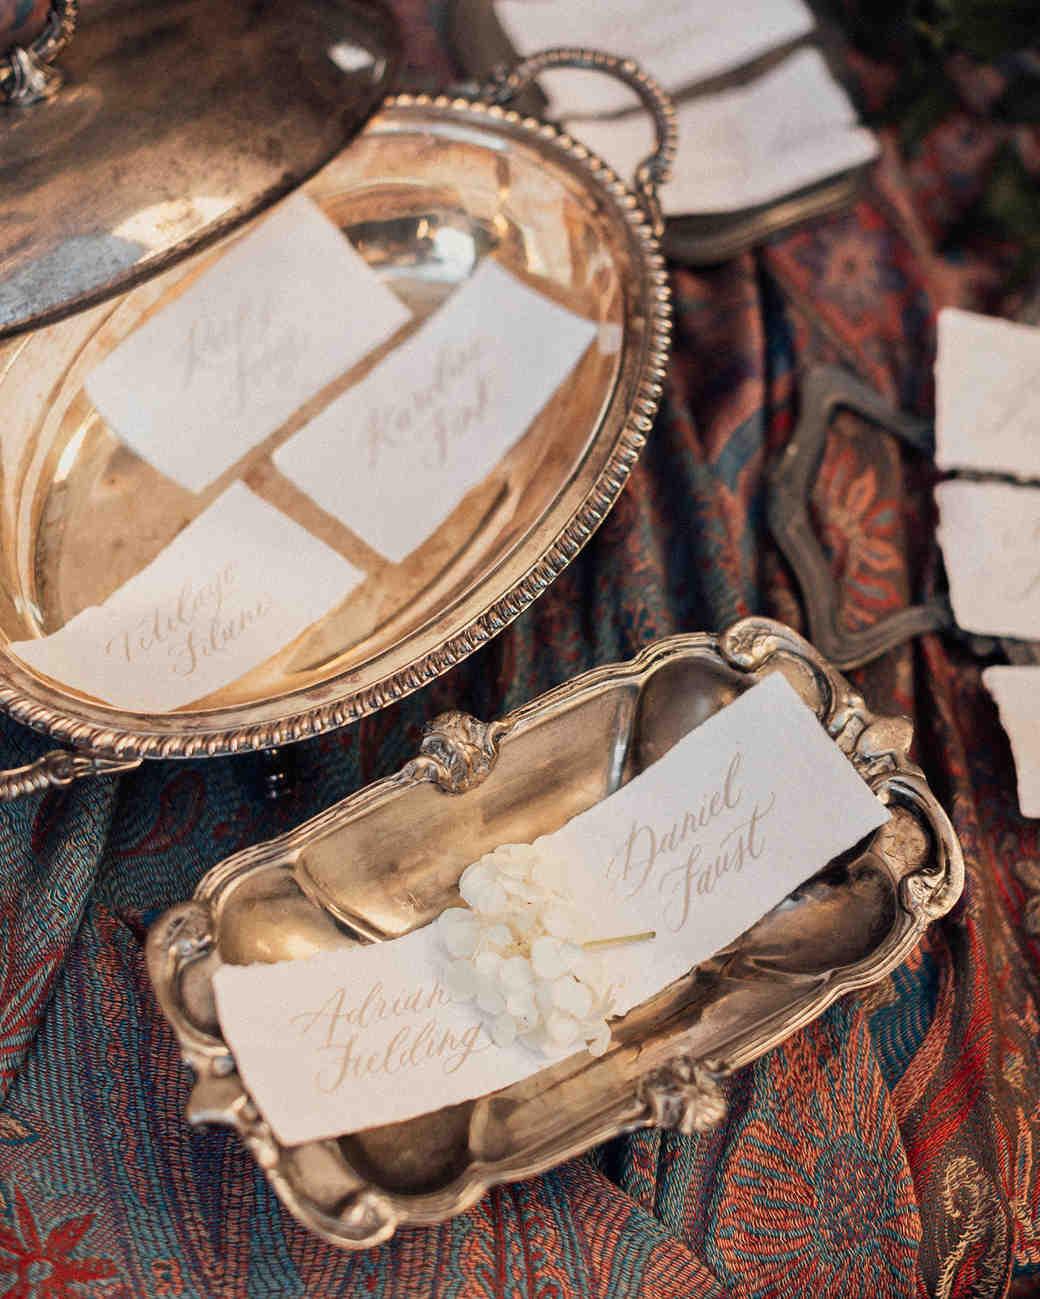 natalie paul wedding escort cards in metal dishes